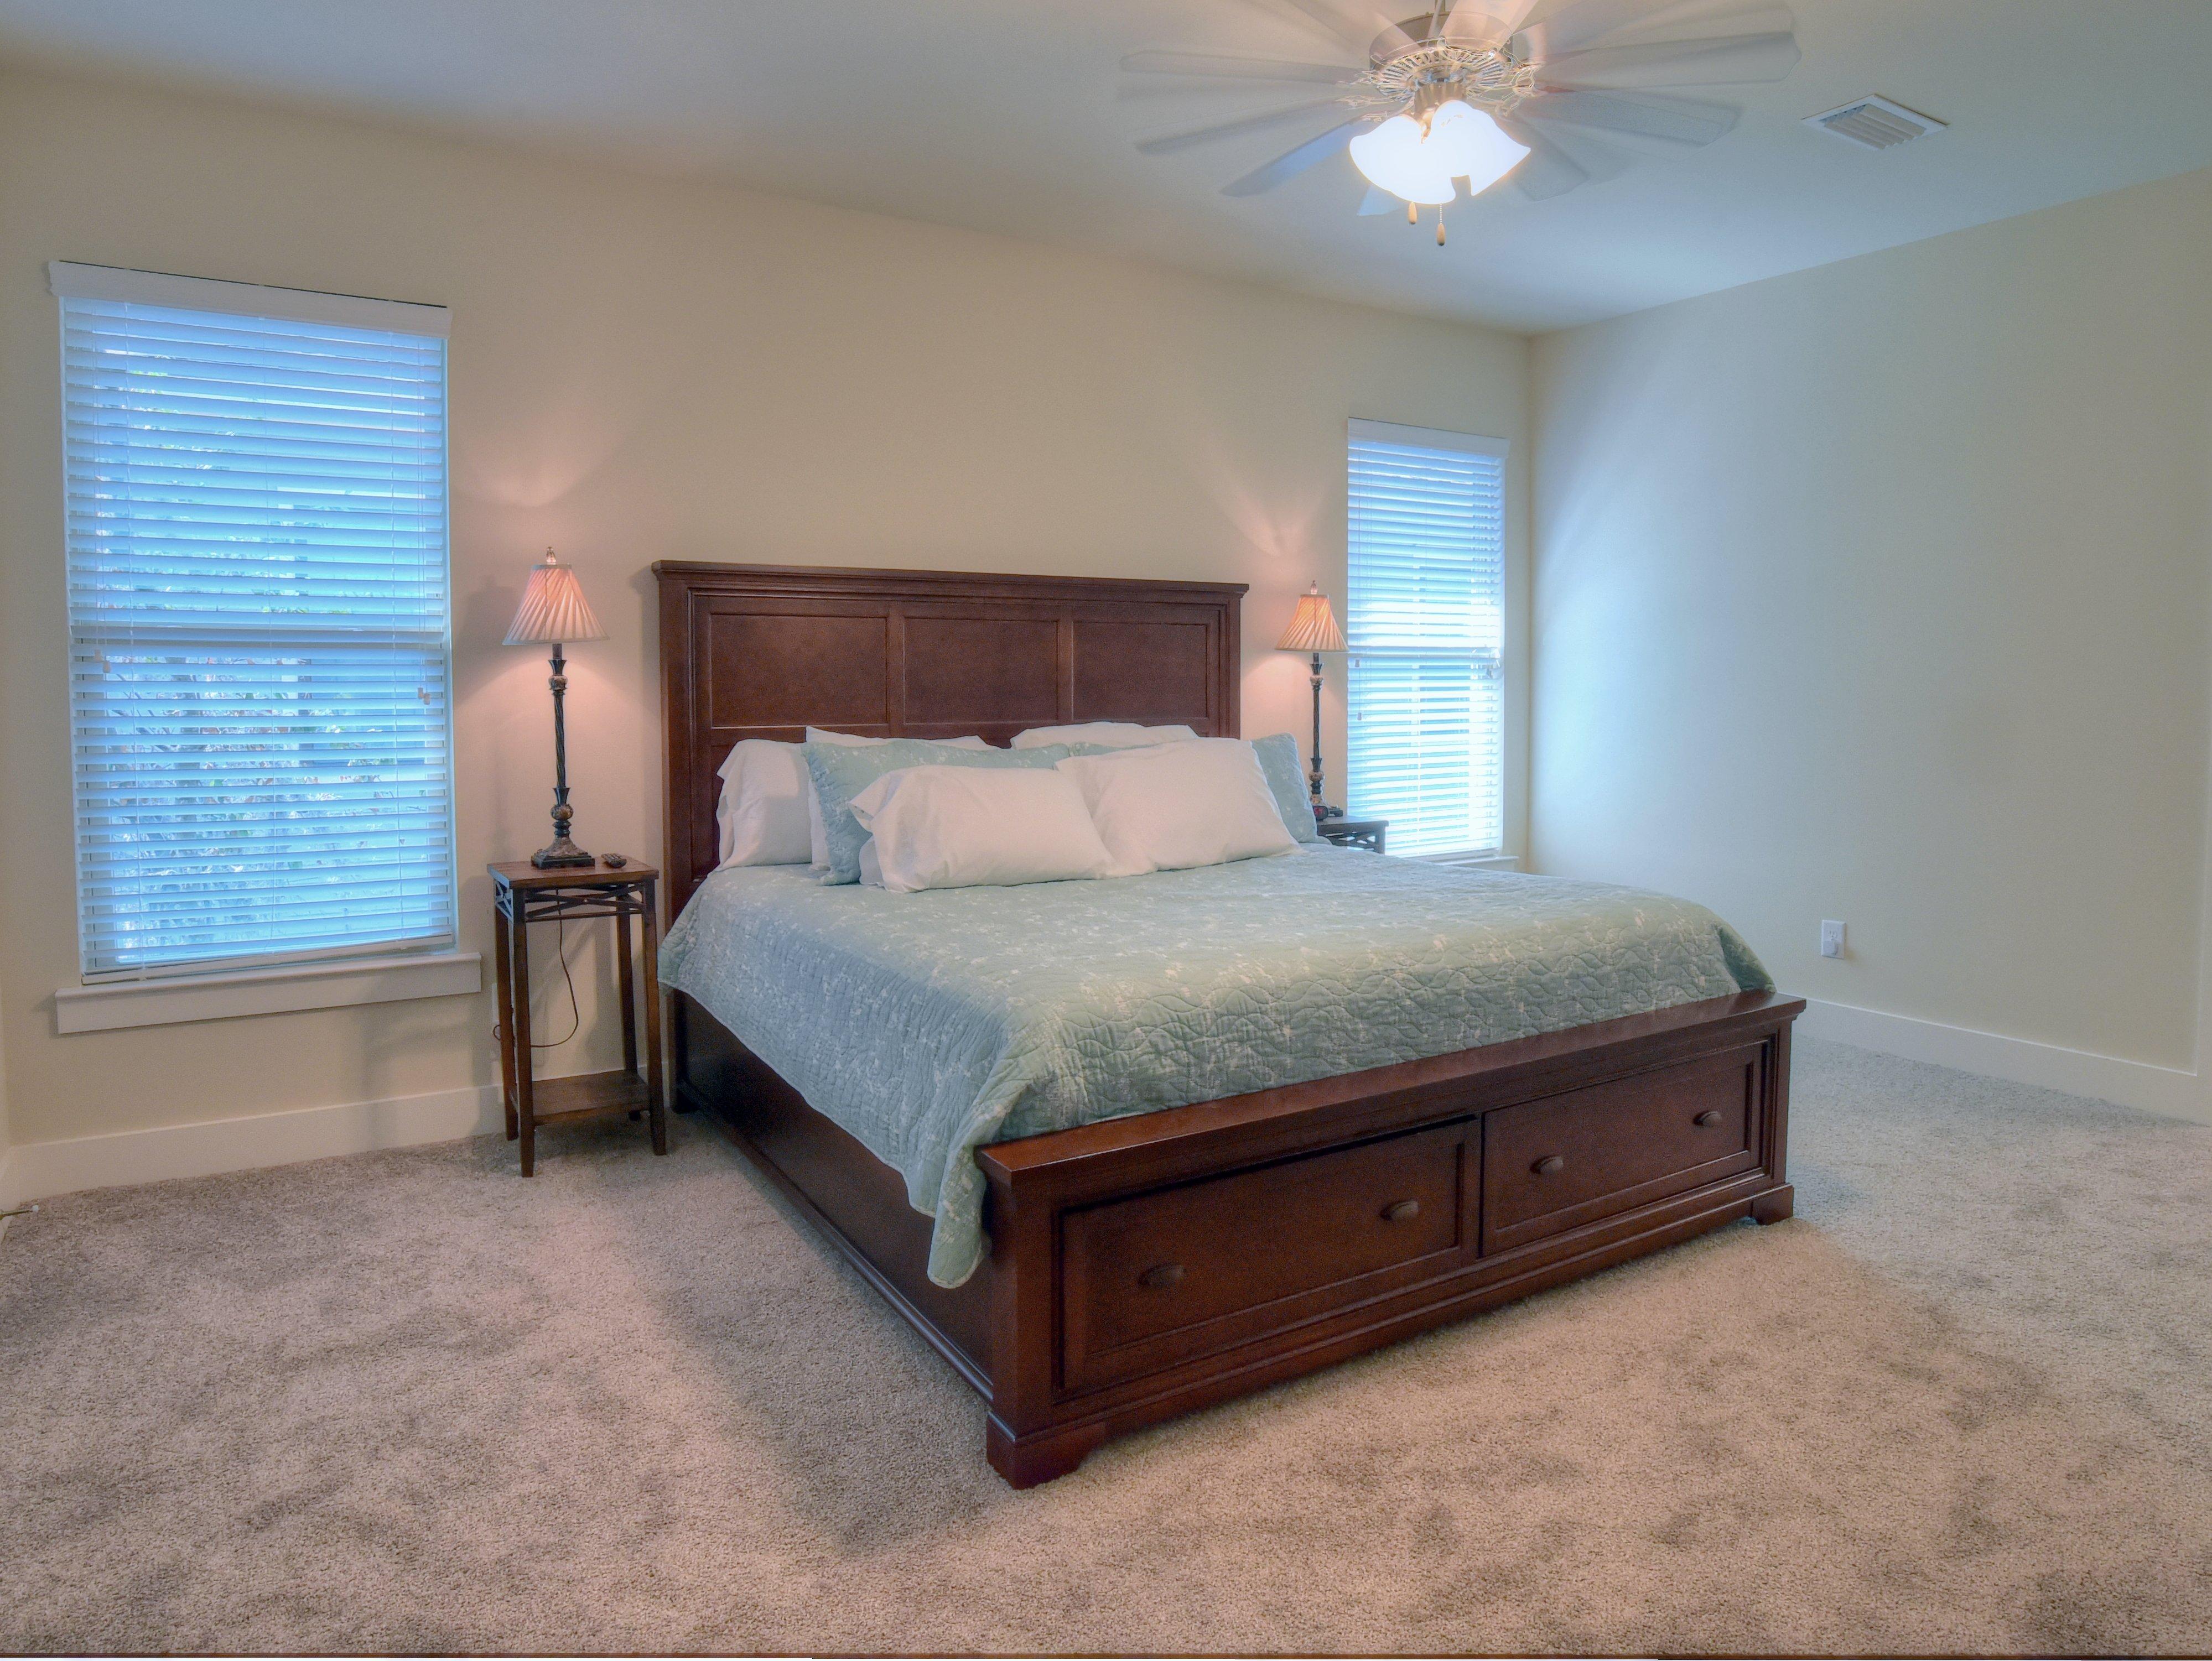 93 Beacon Point Condo rental in Sandestin Rentals ~ Cottages and Villas  in Destin Florida - #20